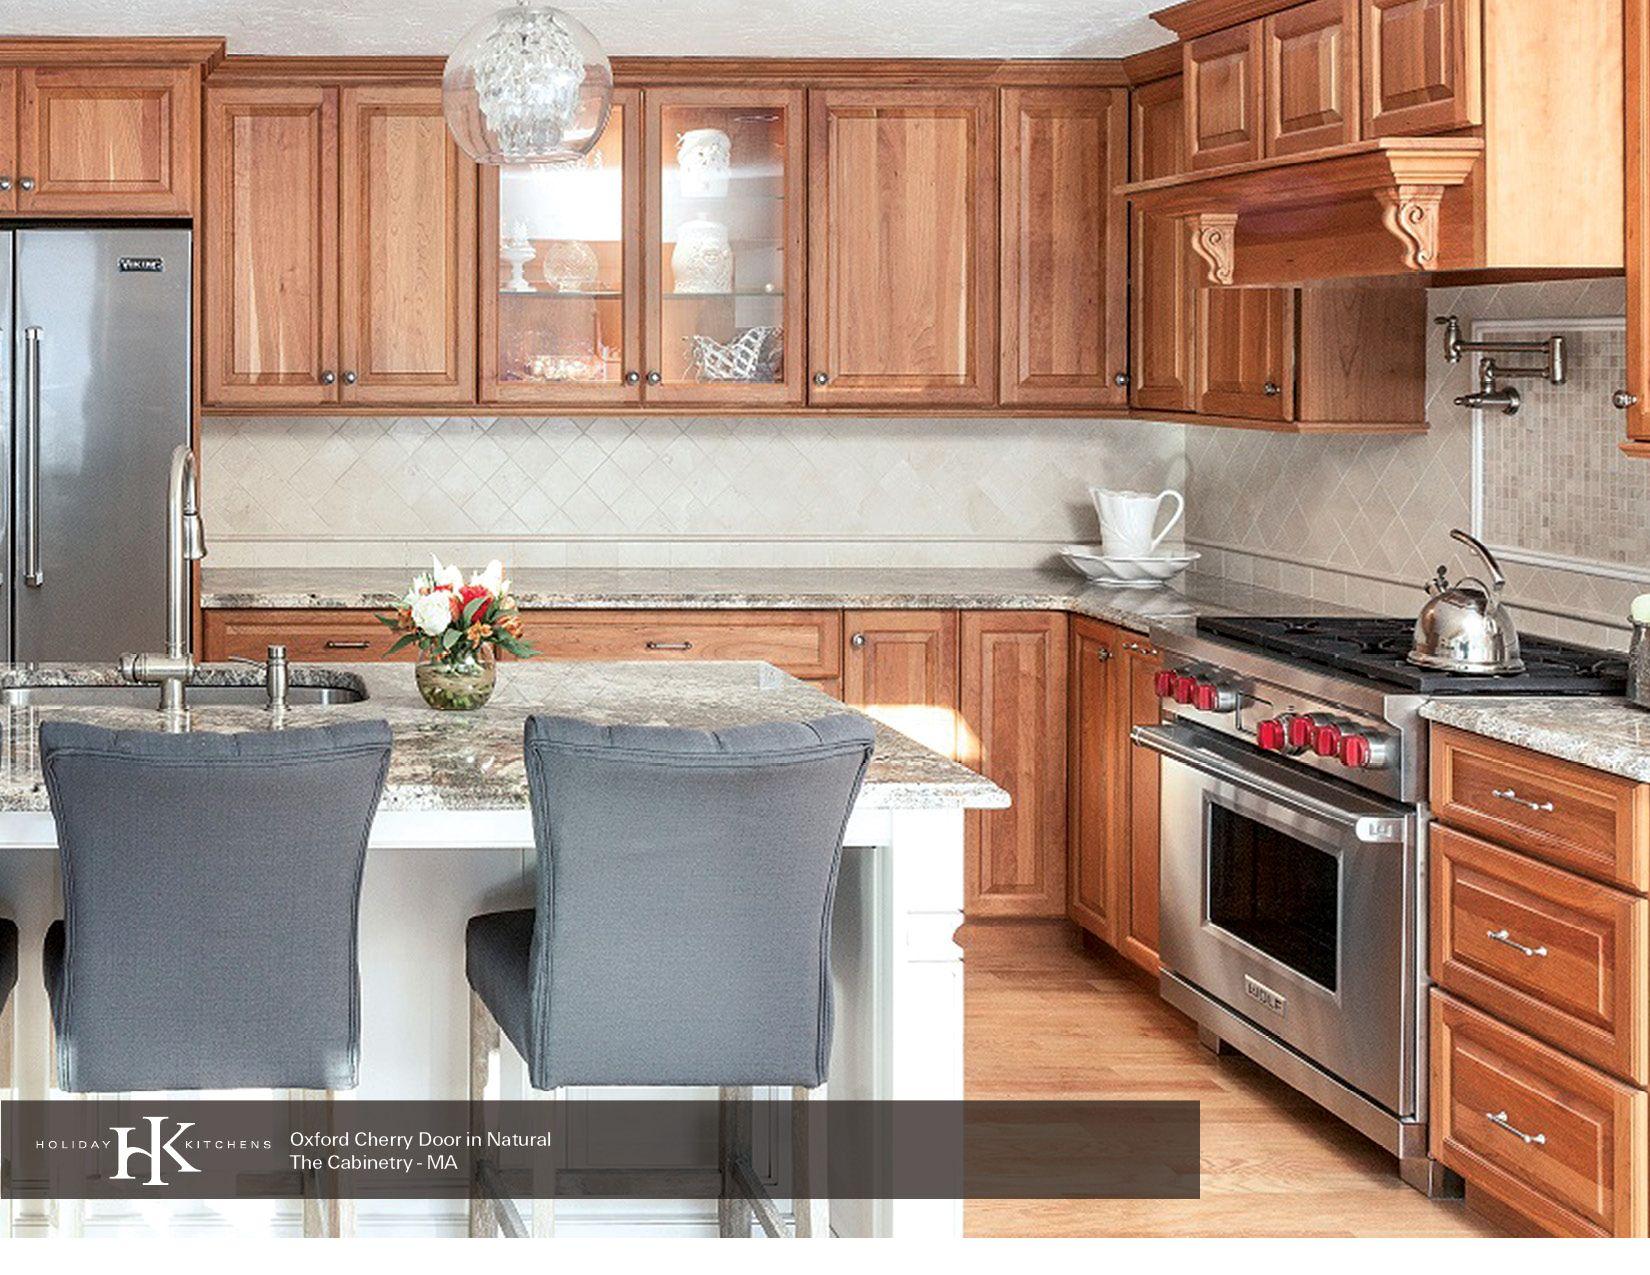 Holiday Kitchens :: Media Gallery   Kitchen, Kitchen ...